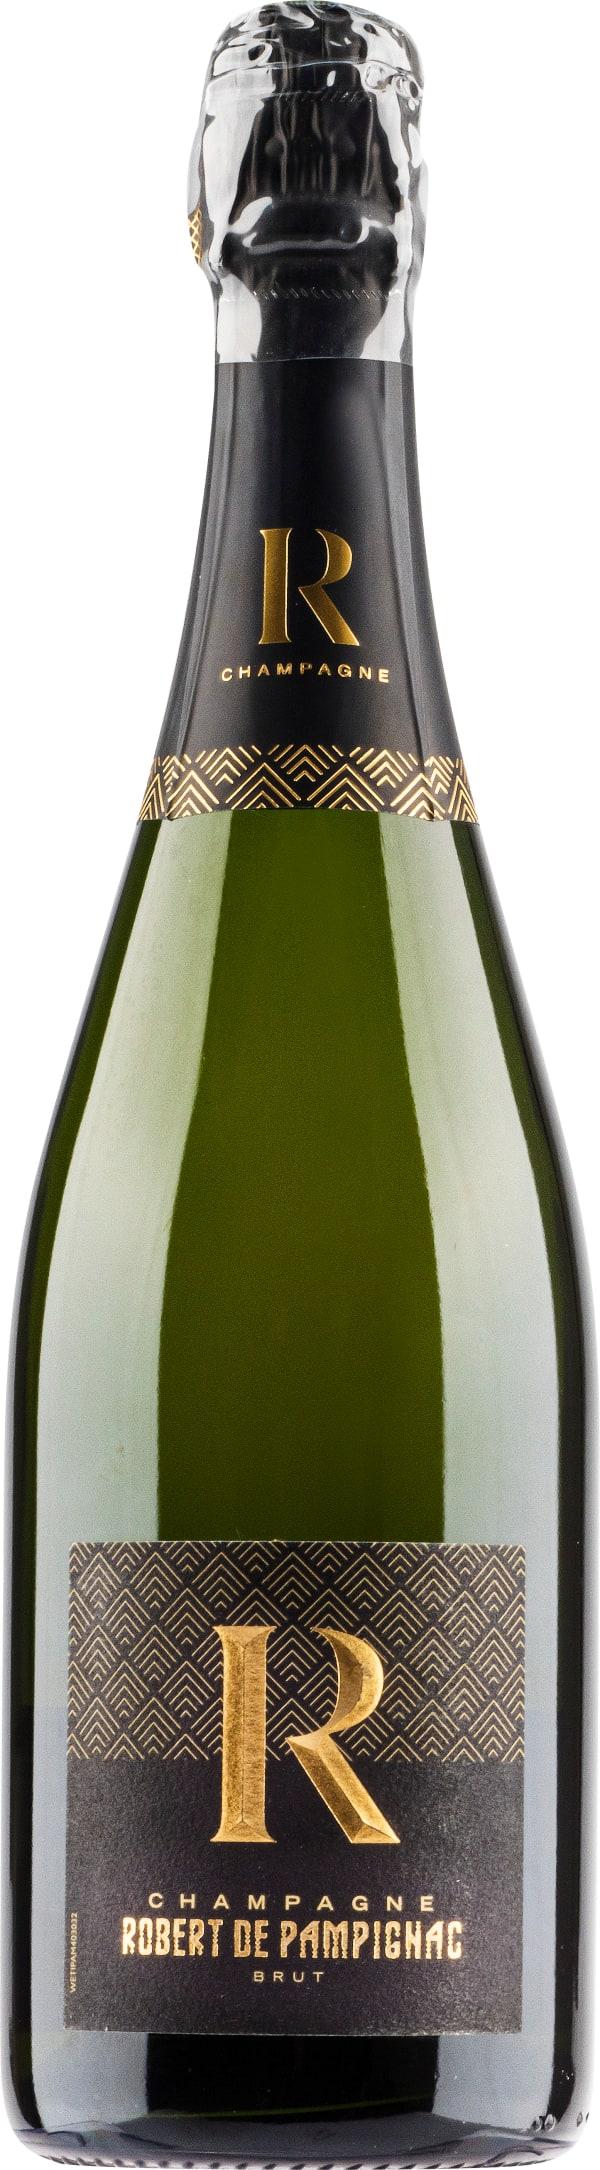 Robert de Pampignac Champagne Brut